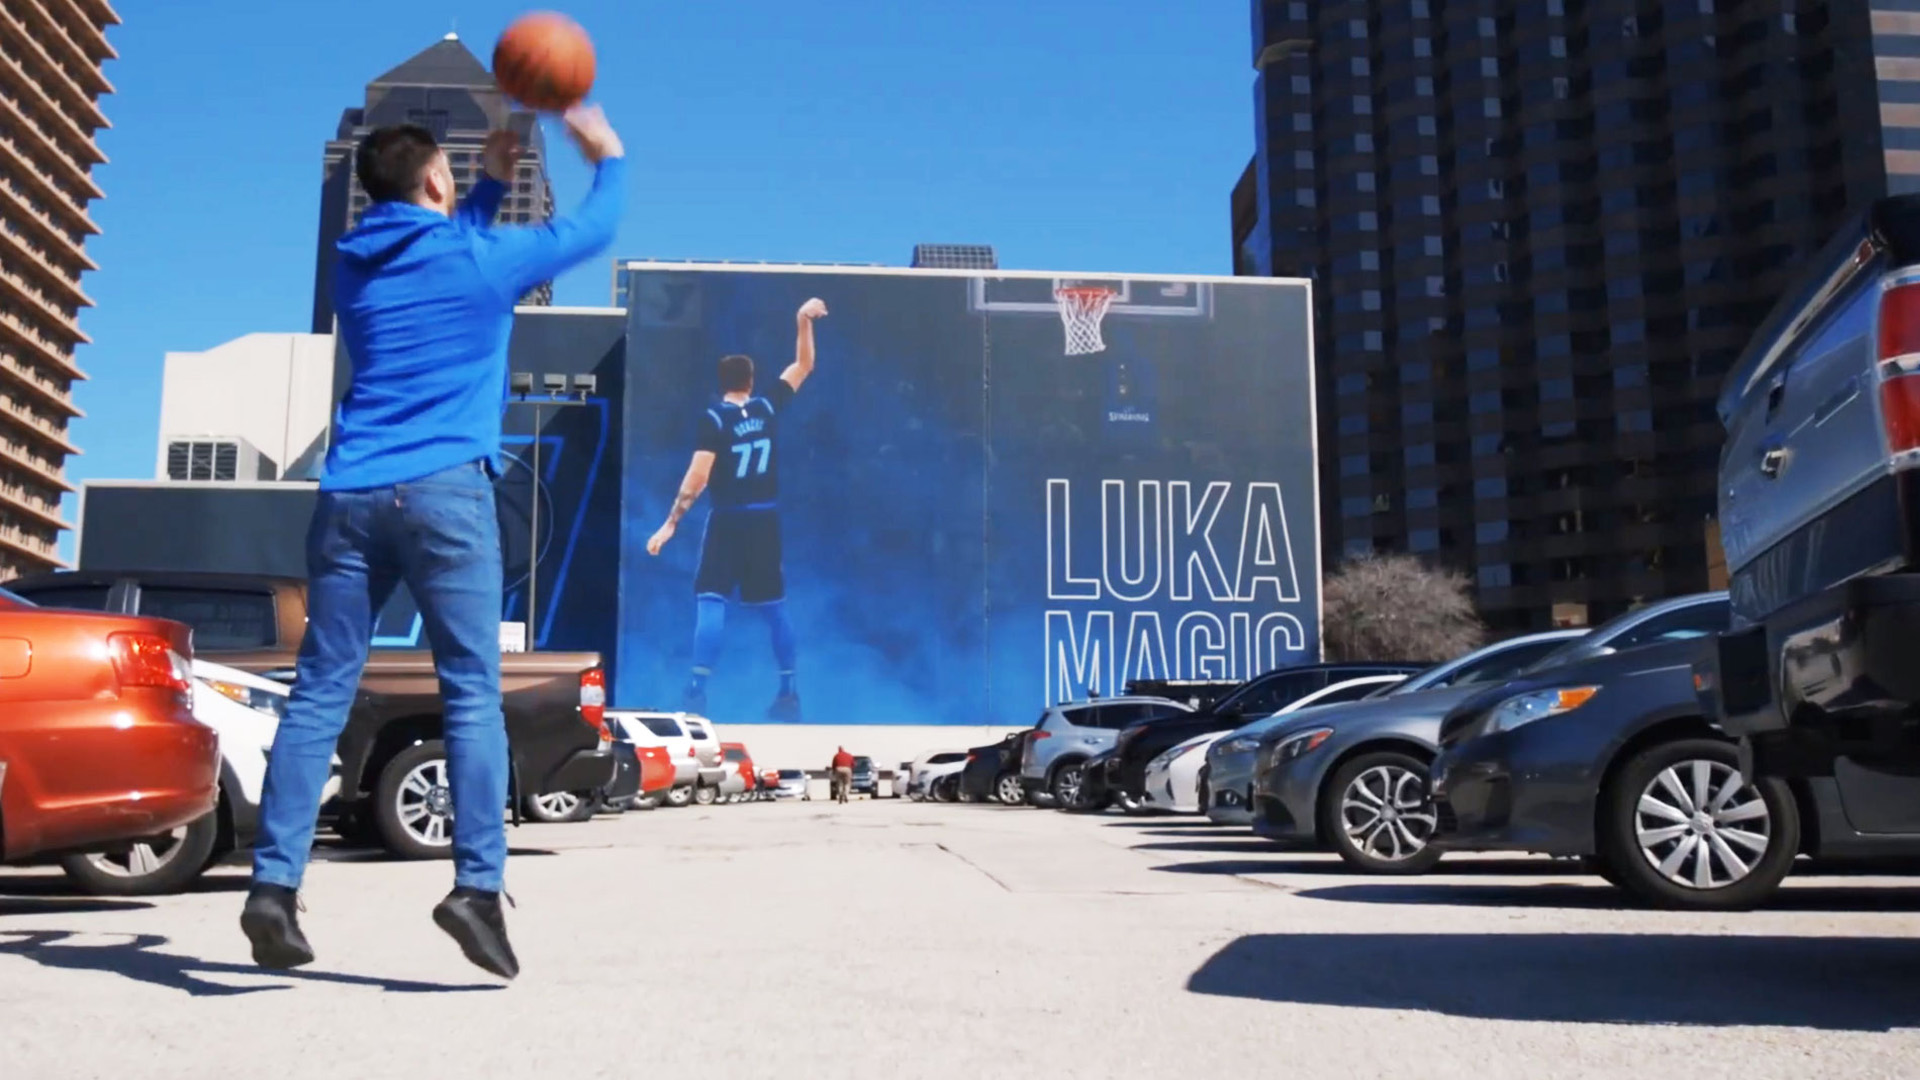 Luka Mavs AR Augmented Reality Dallas Mavericks